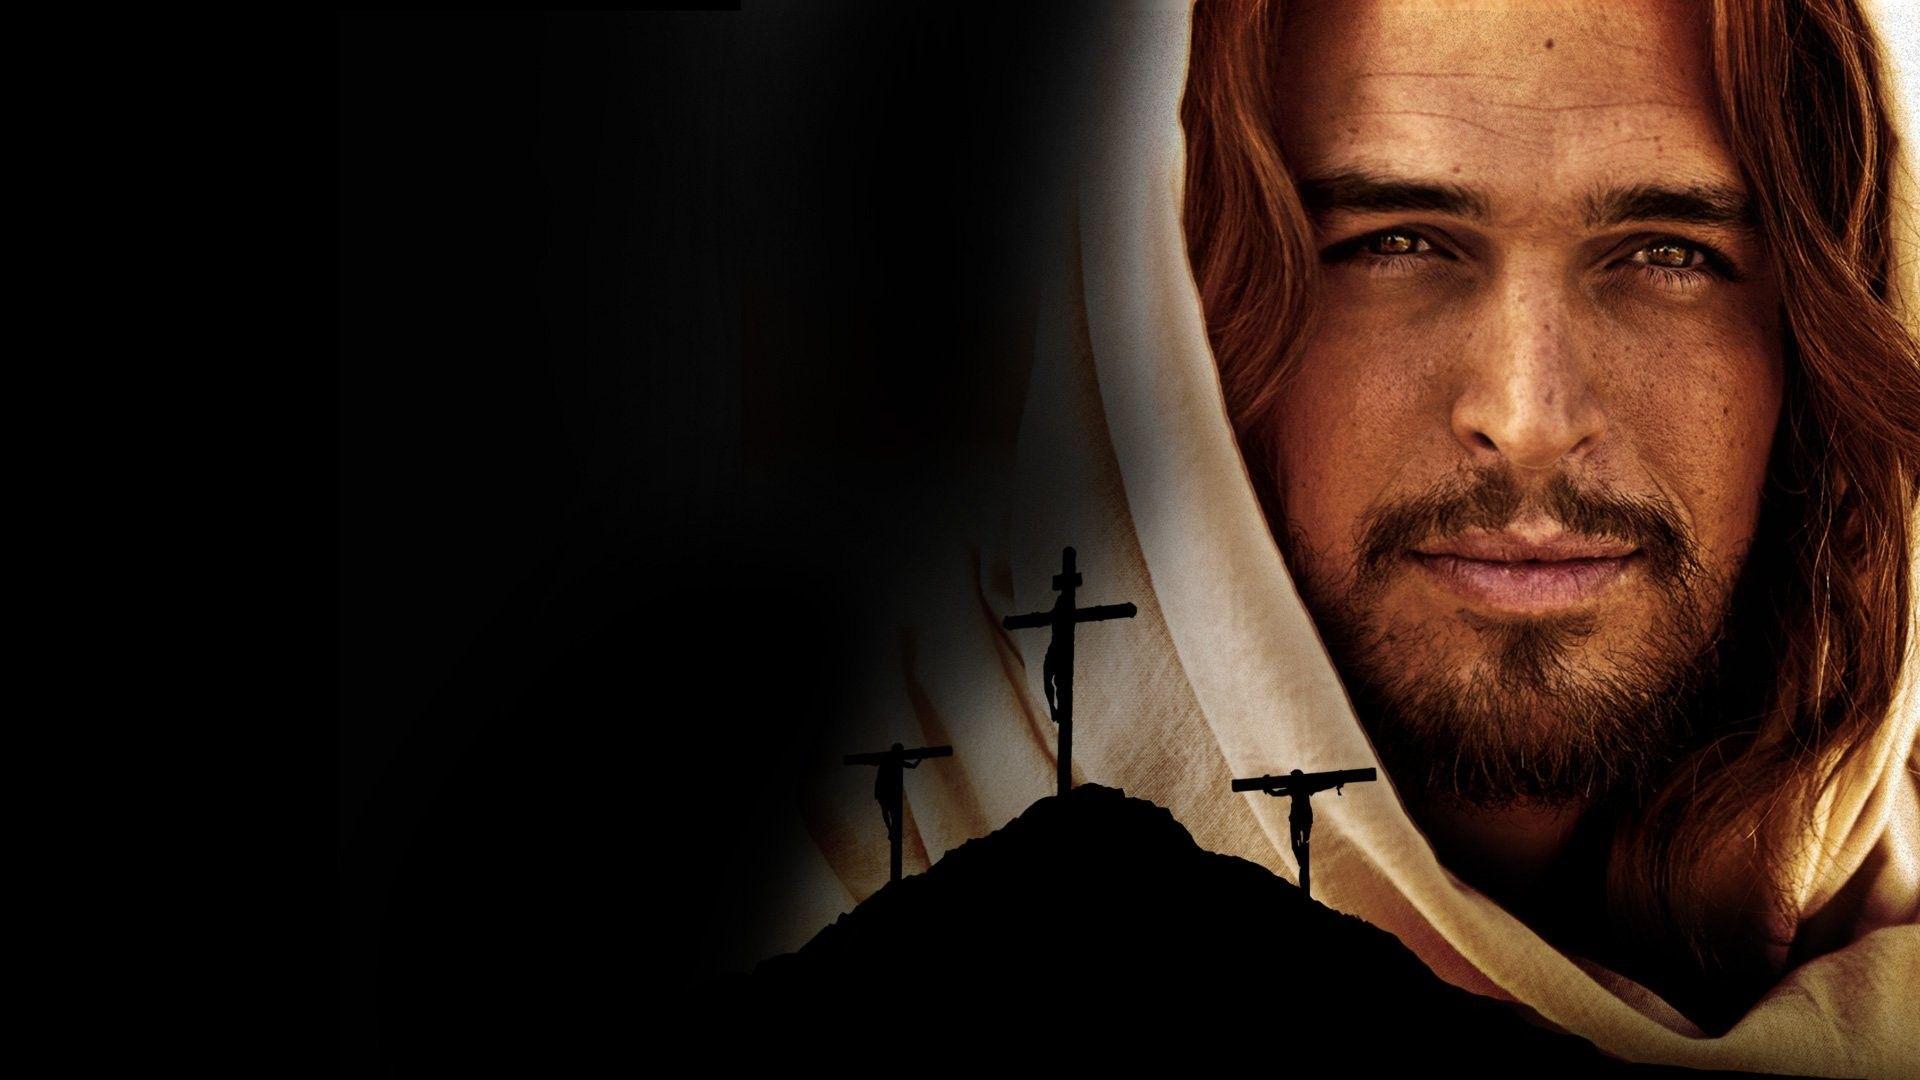 1920x1080 Son Of God Movie Hd Wallpaper 02 Jesus Pictures Jesus